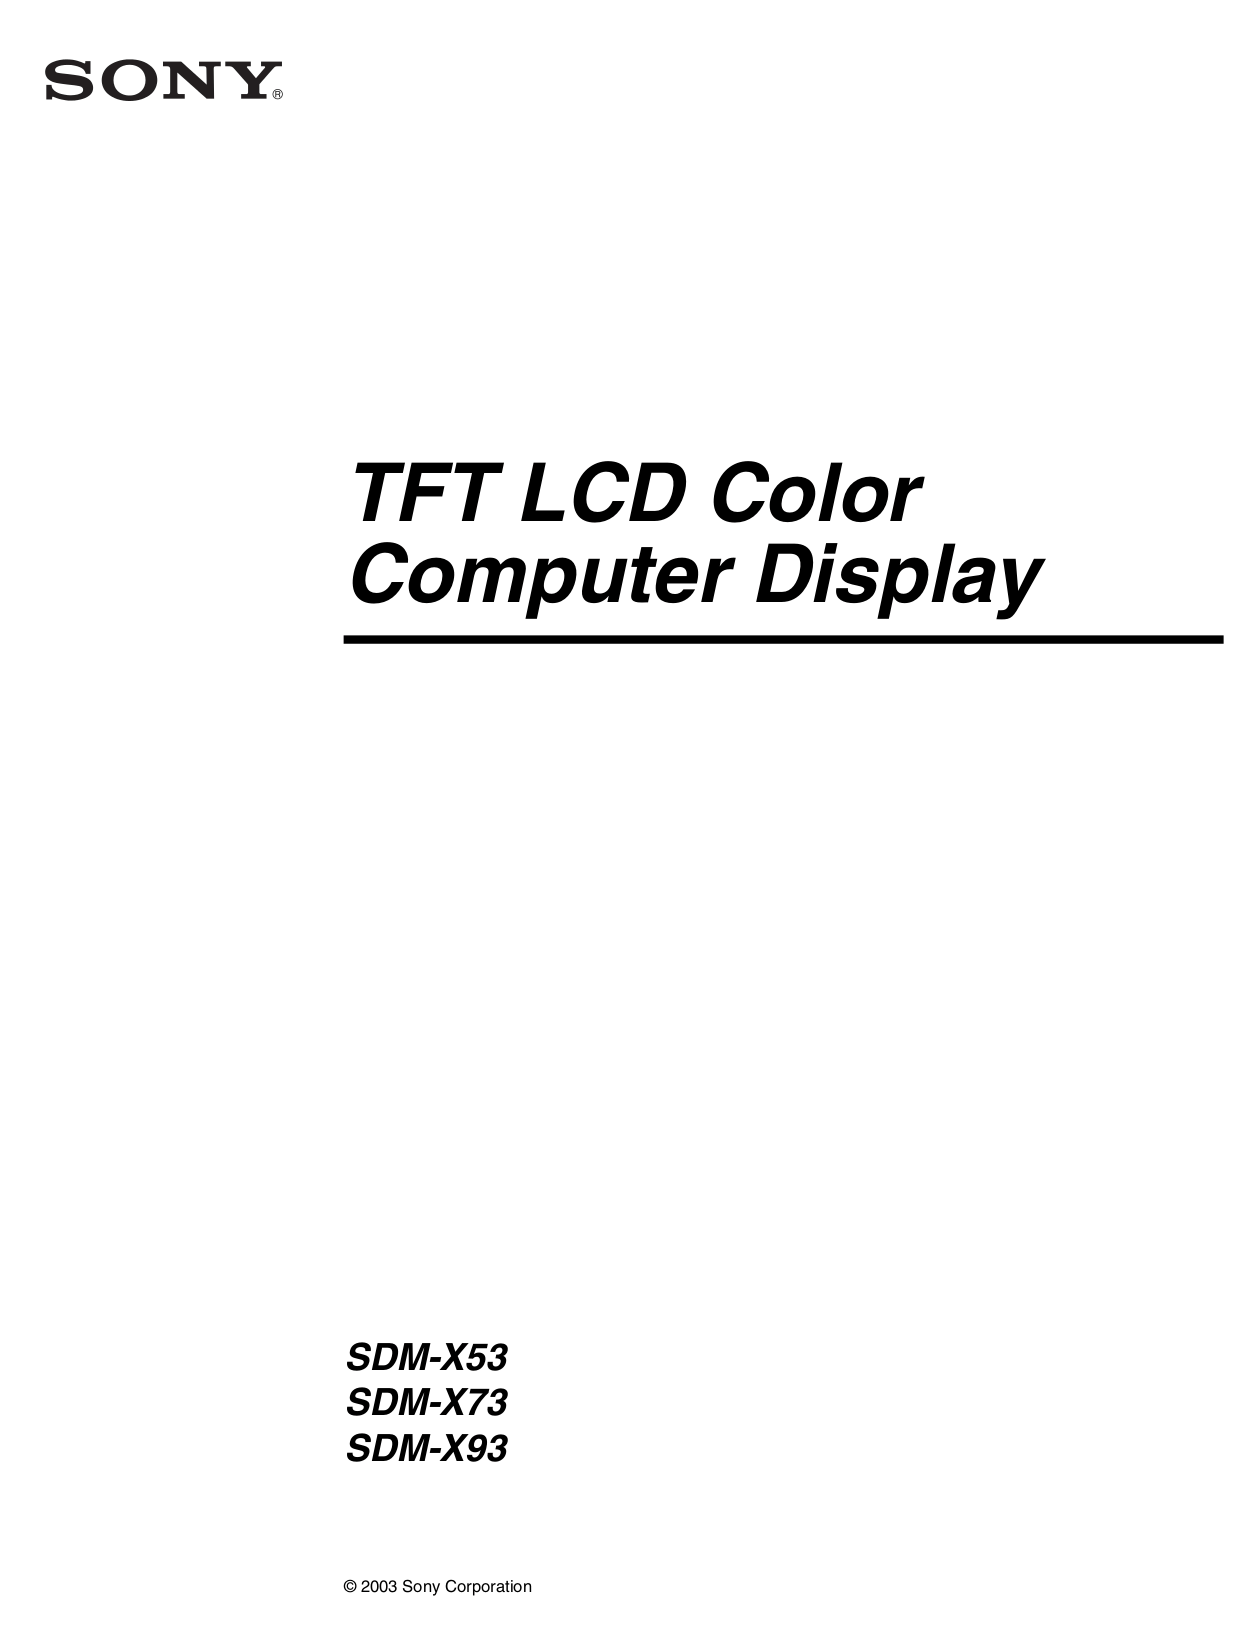 Download free pdf for Sony SDM-X93 Monitor manual